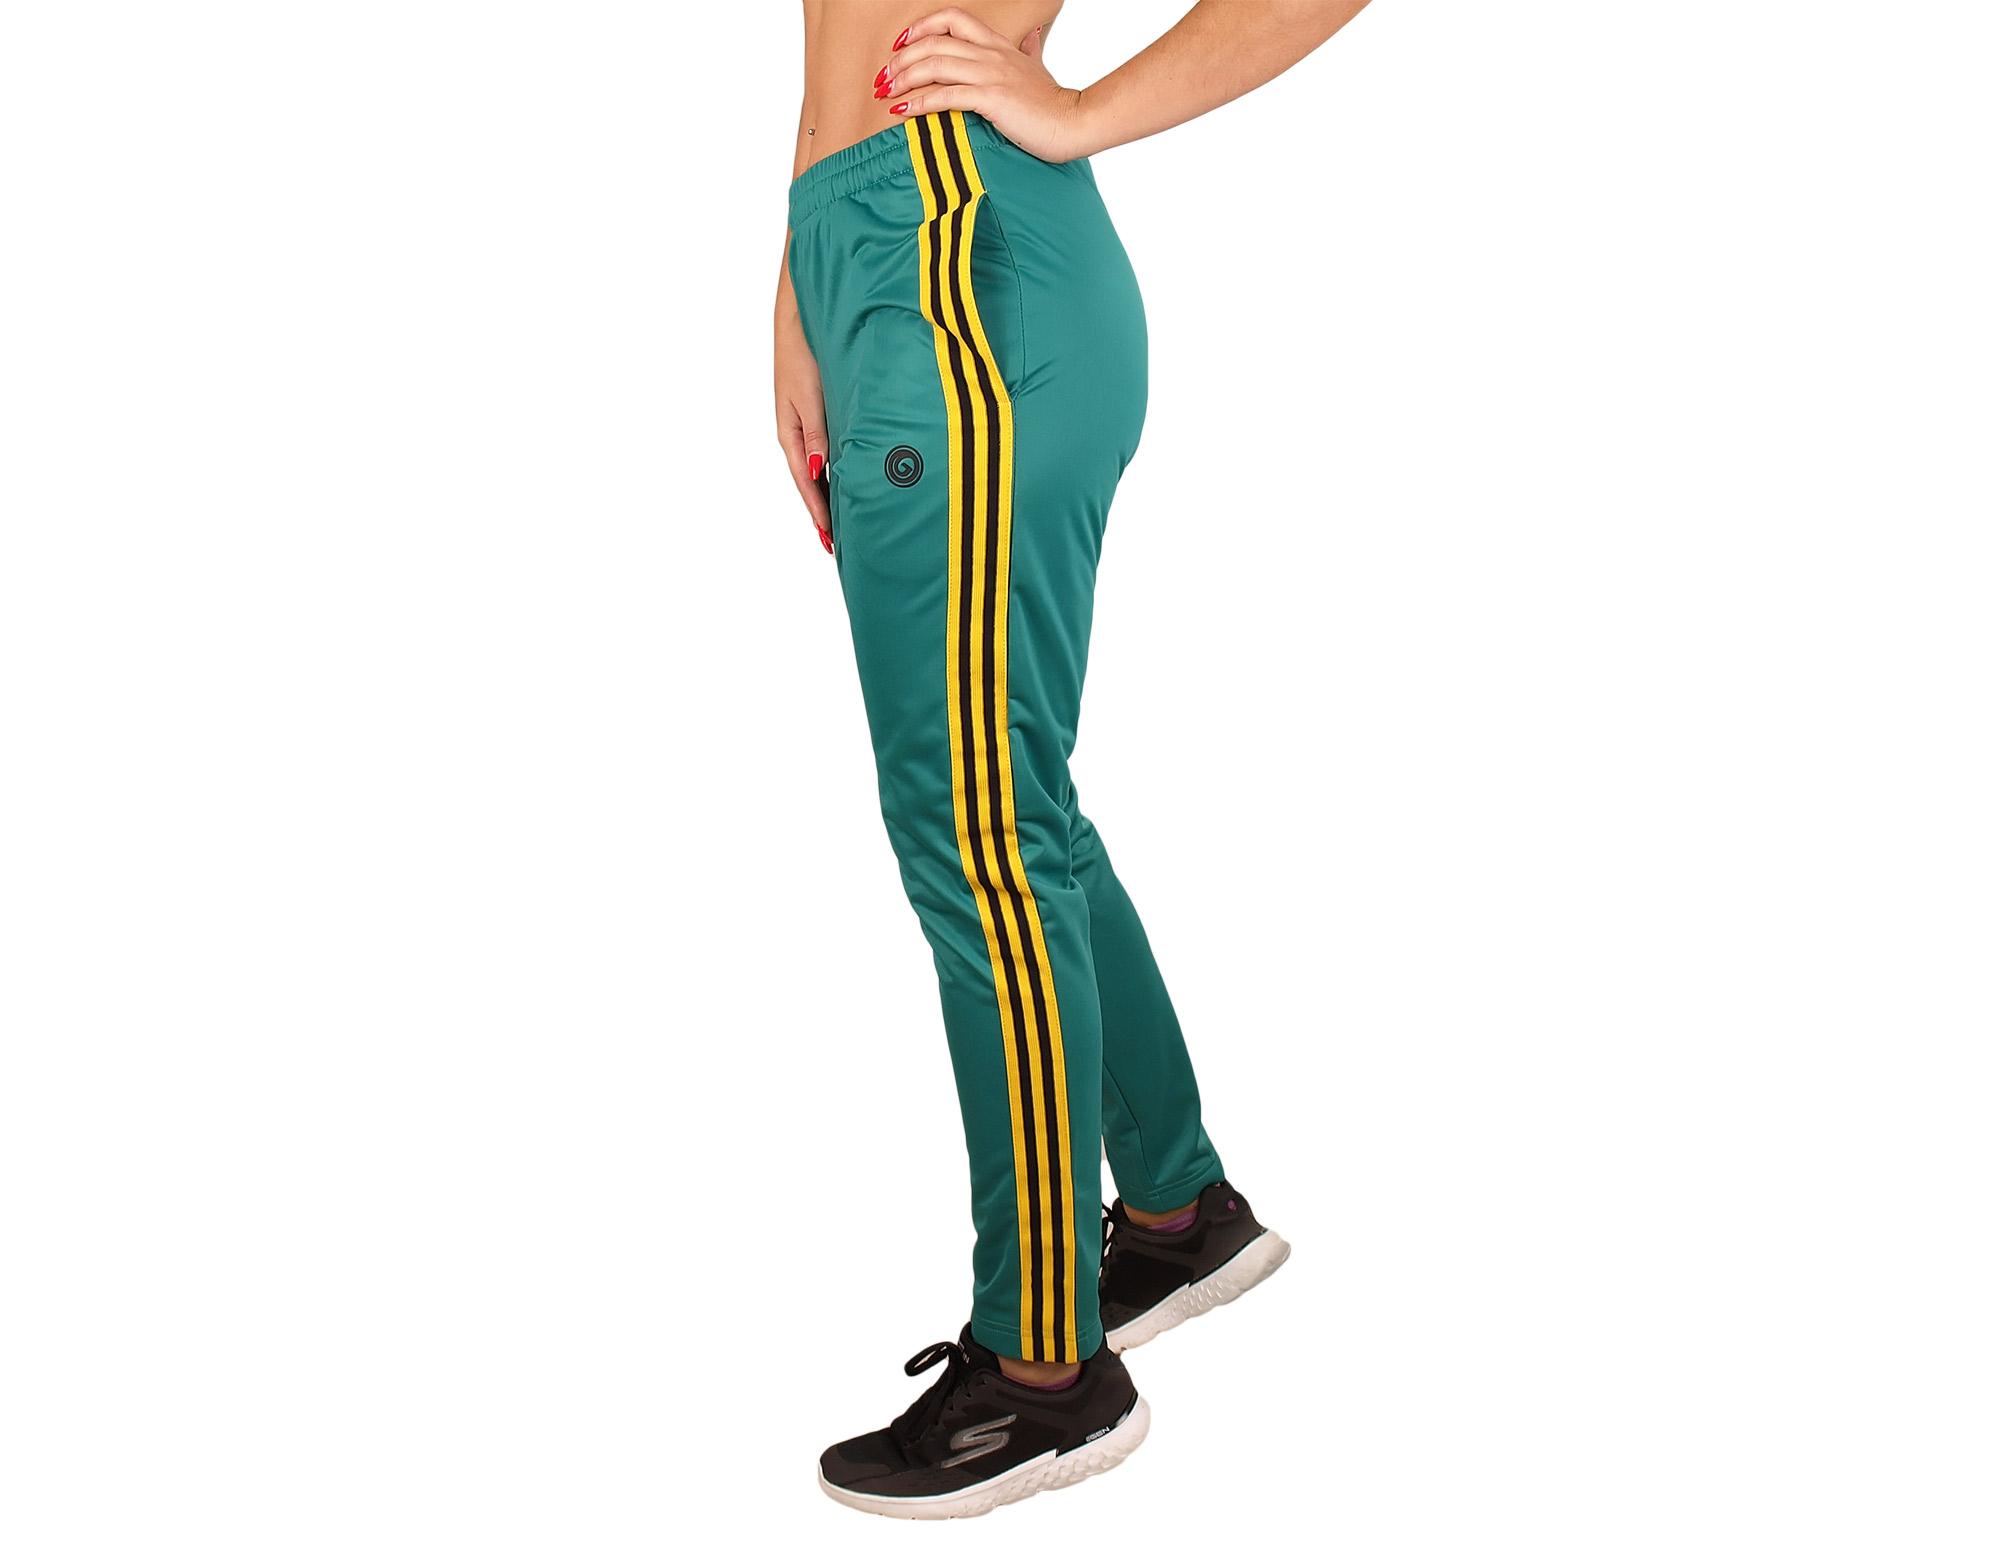 Pantalones deportivos para mujer